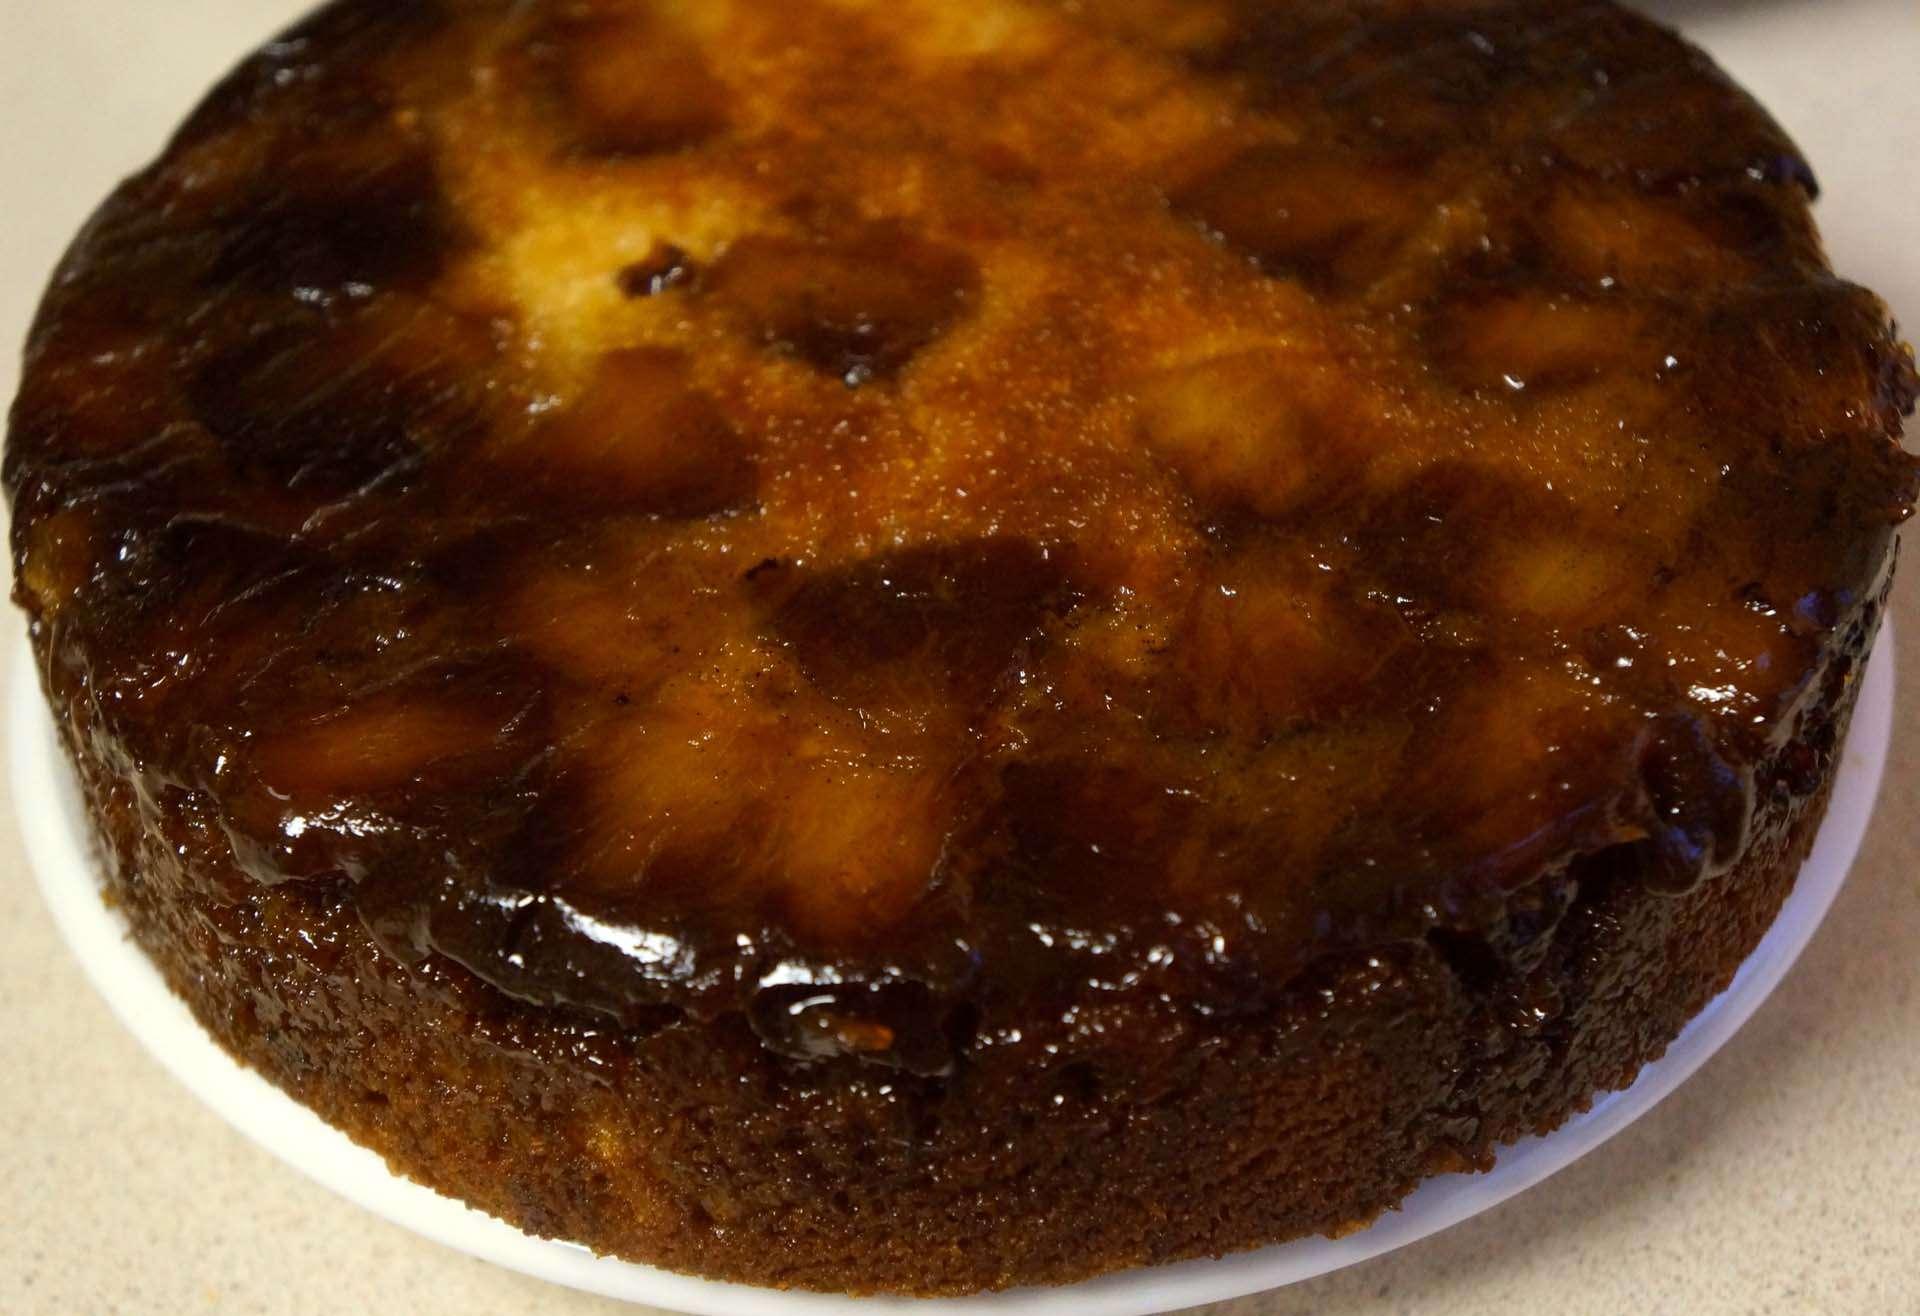 Gemma's Pineapple Upside-Down Cake